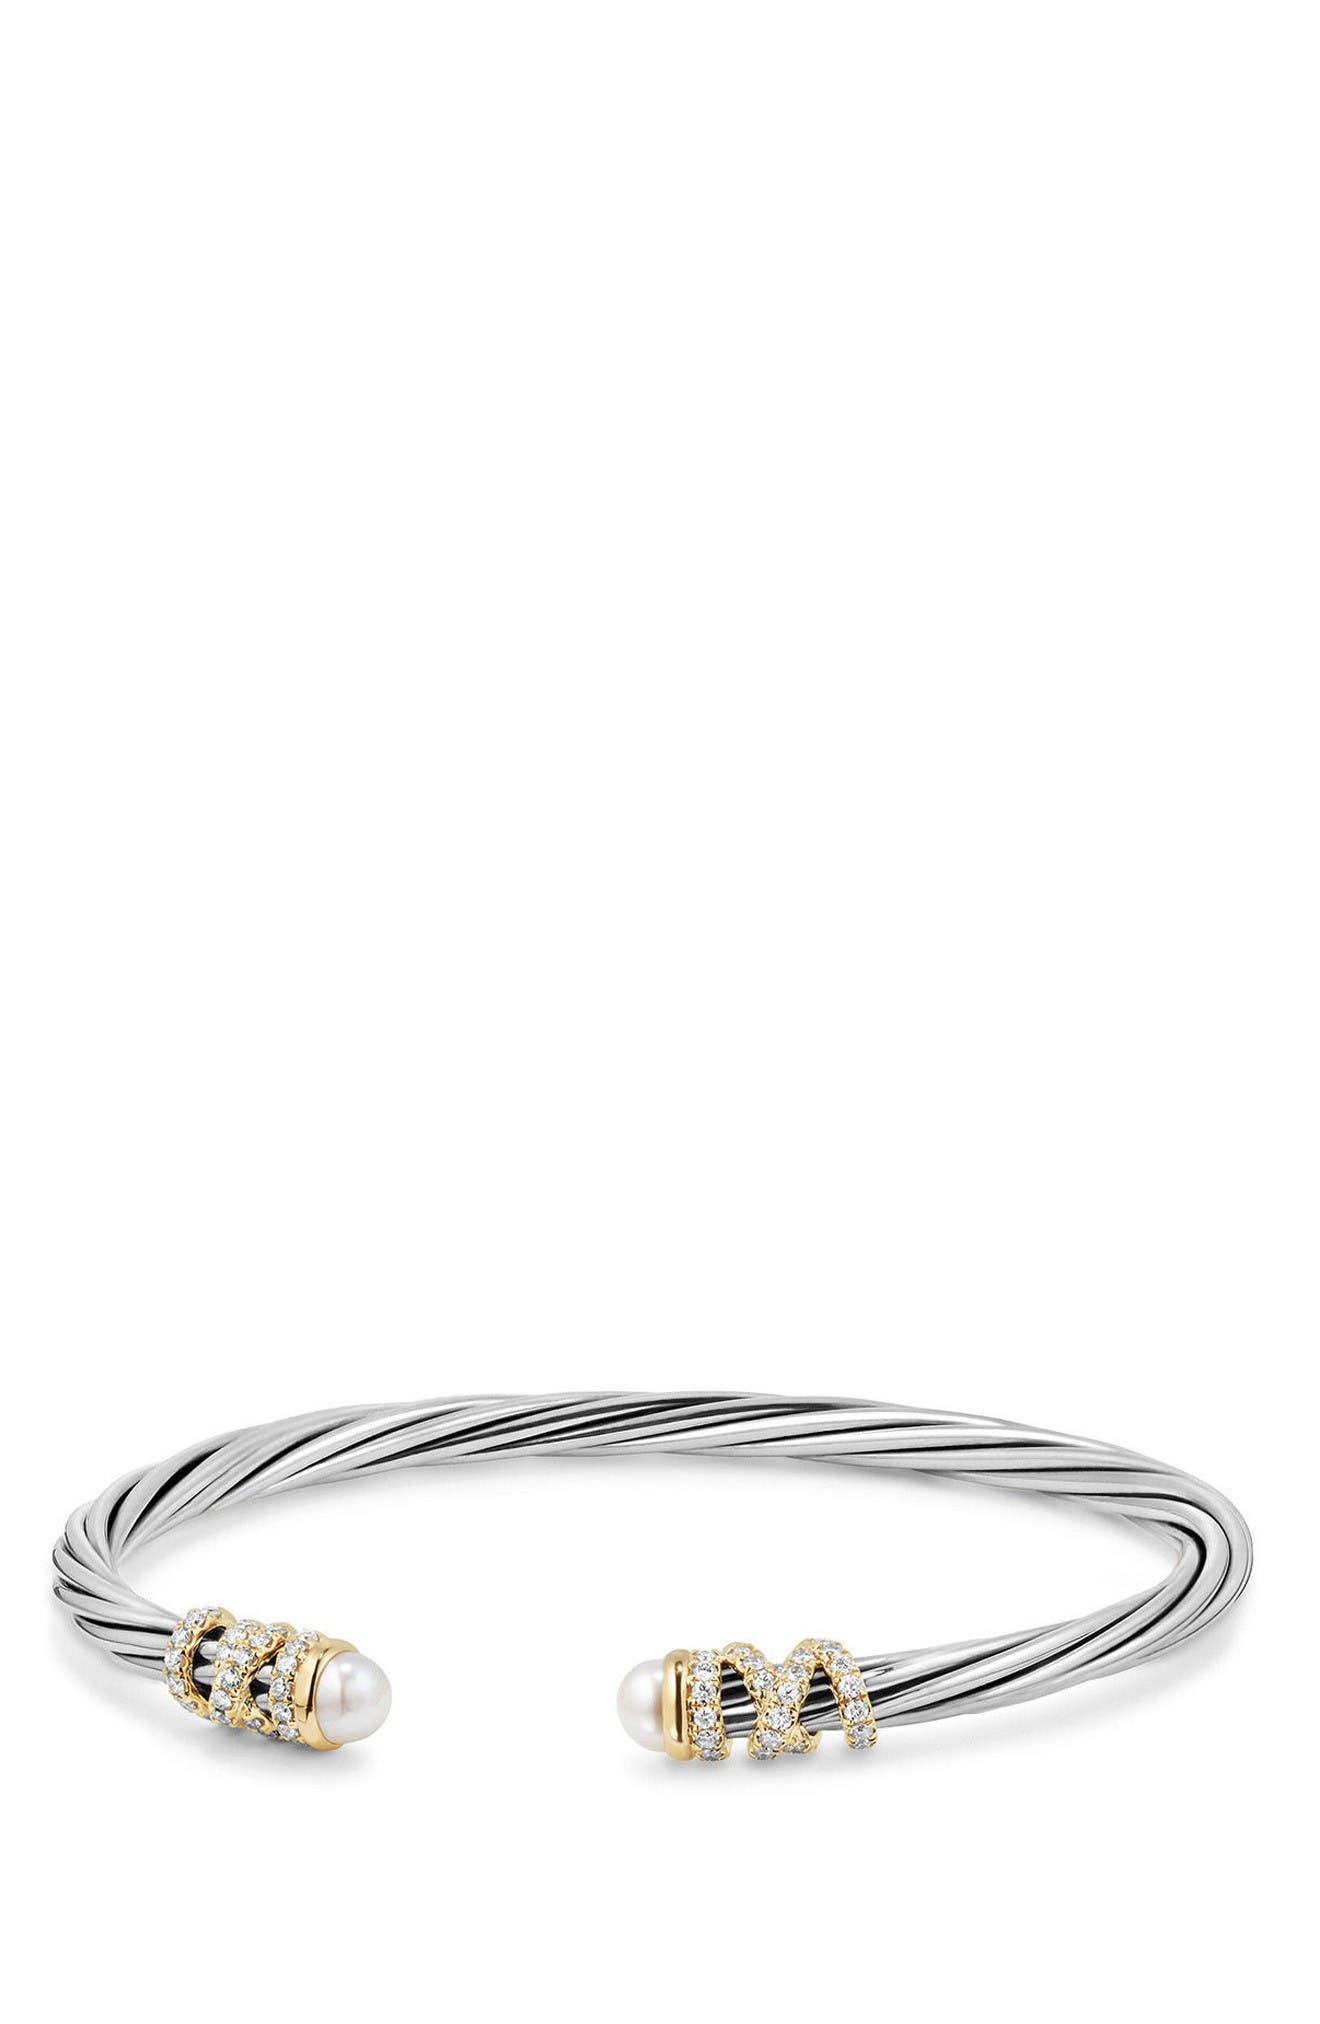 Alternate Image 1 Selected - David Yurman Helena End Station Bracelet with Pearls & Diamonds, 4mm